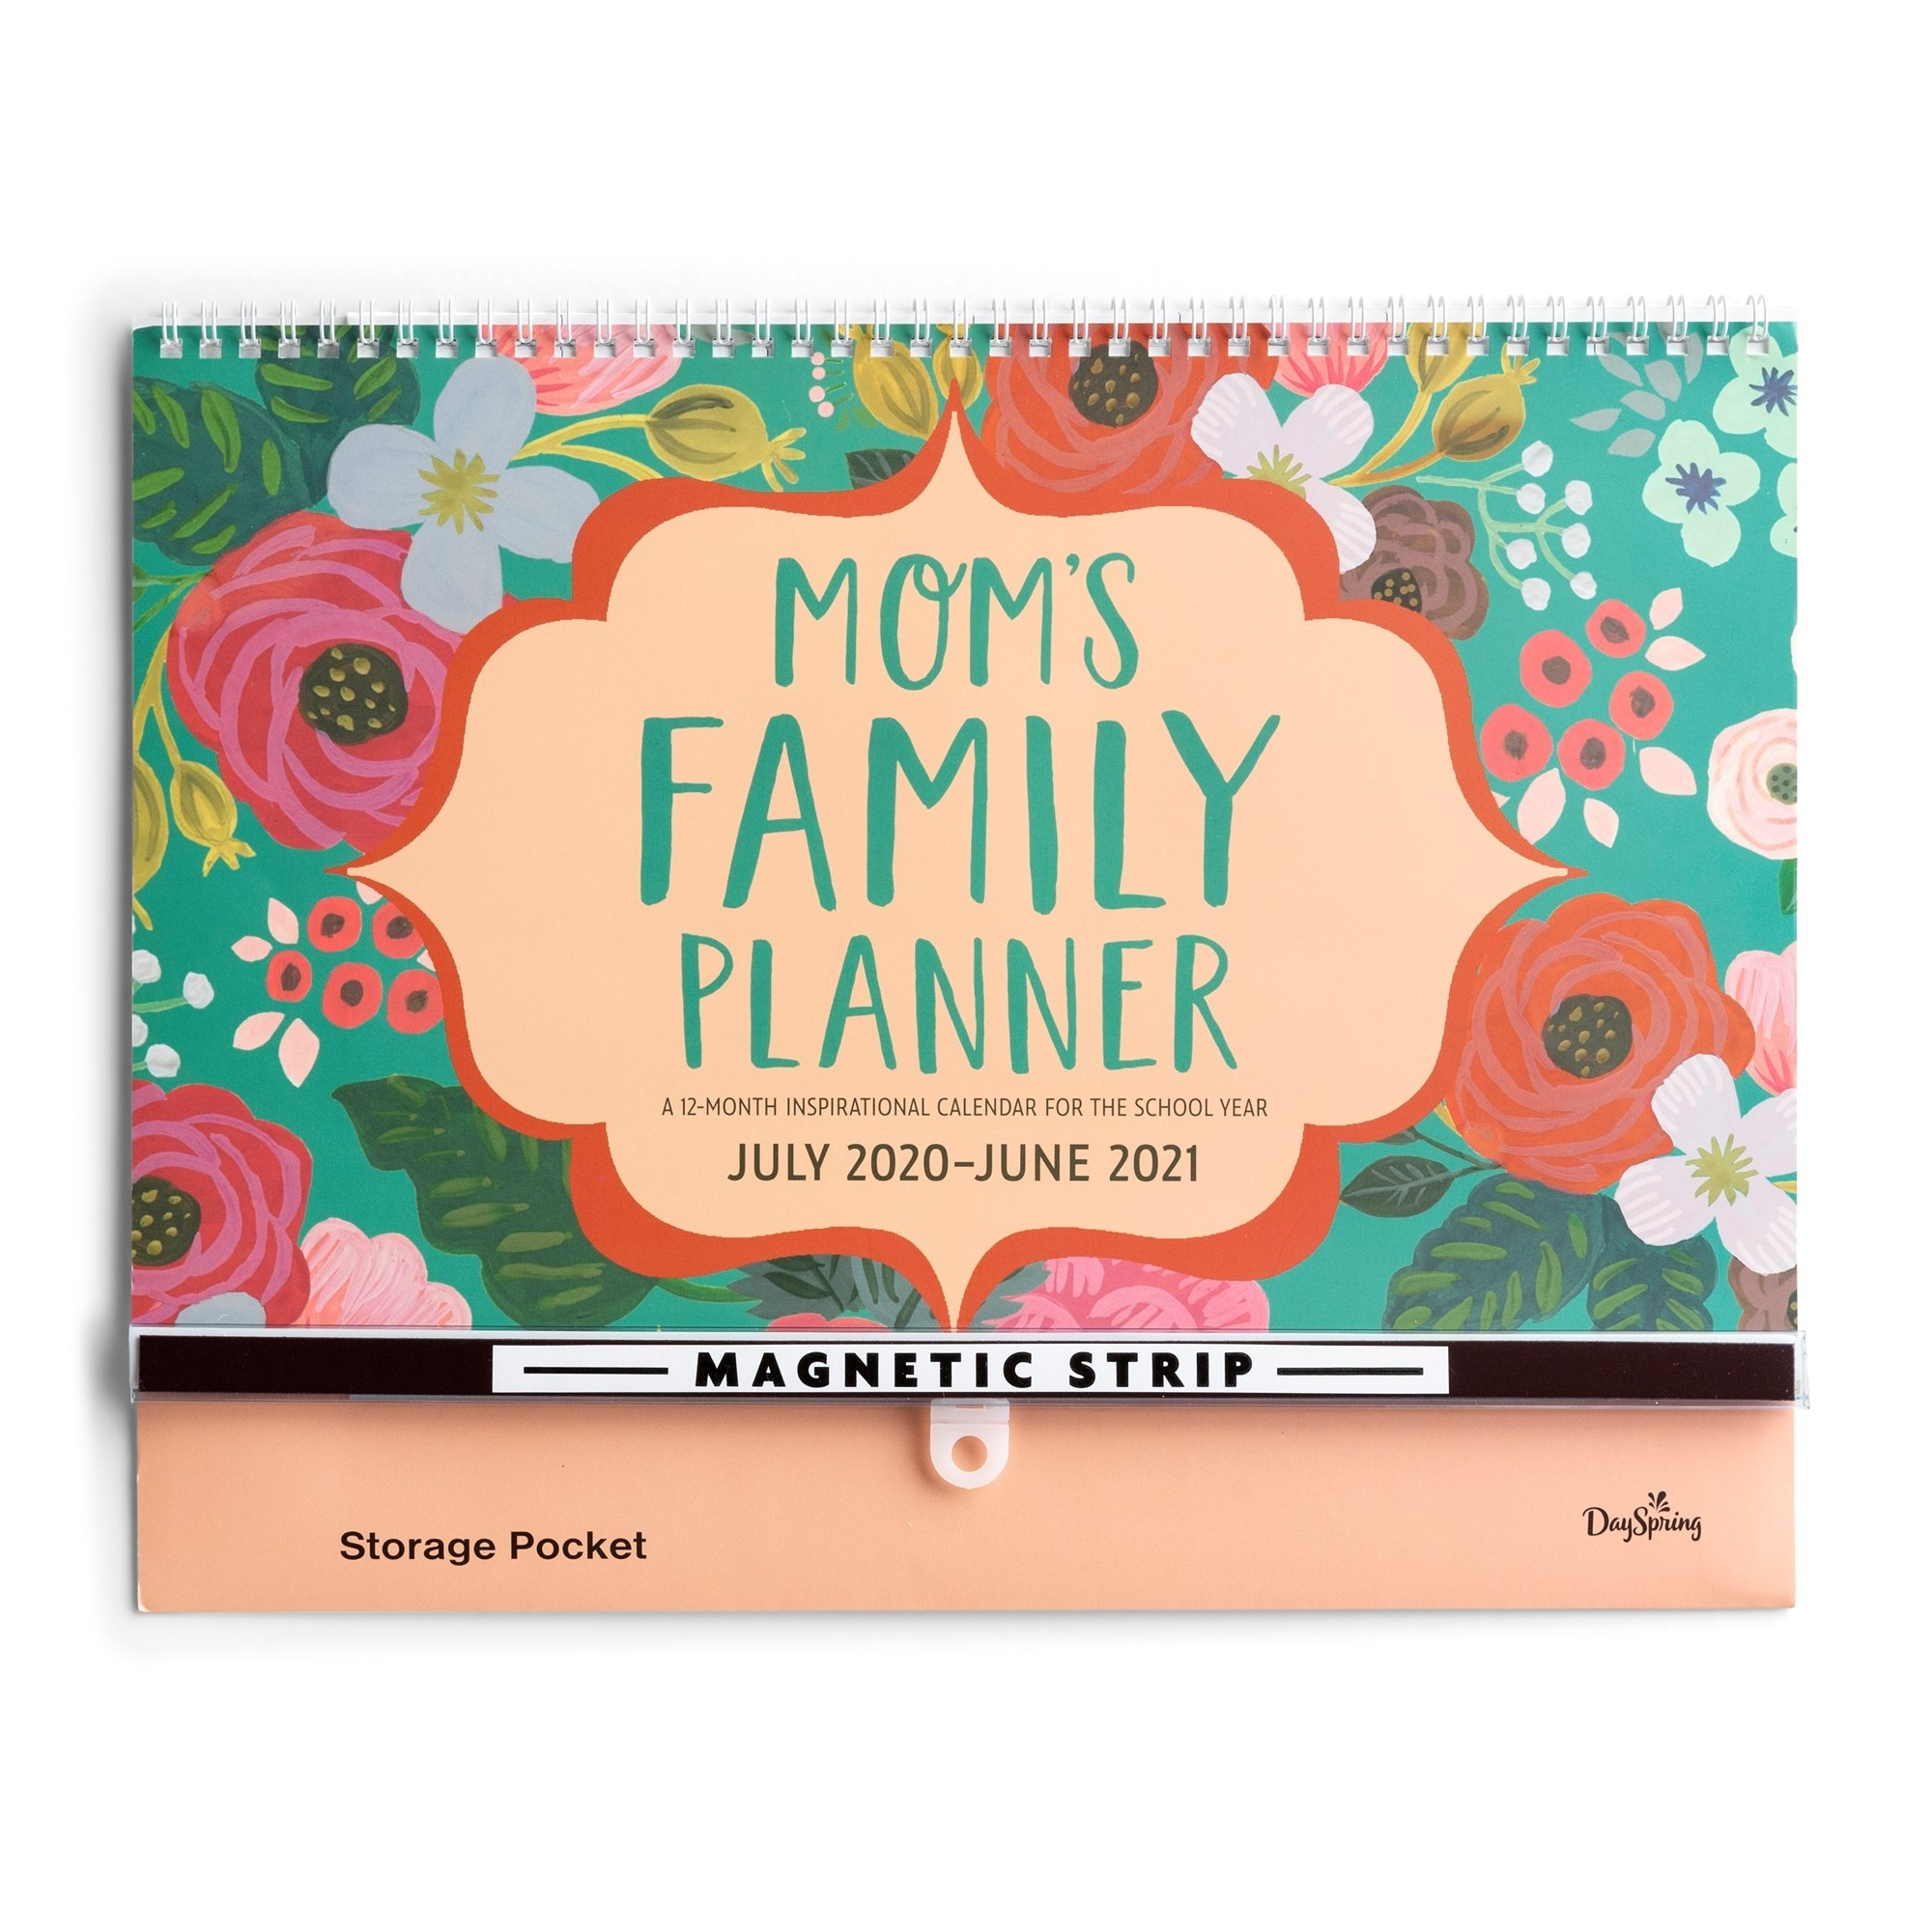 Dayspring, 2020 2021 Moms School Year Family Planner, 849996558 -  Walmart